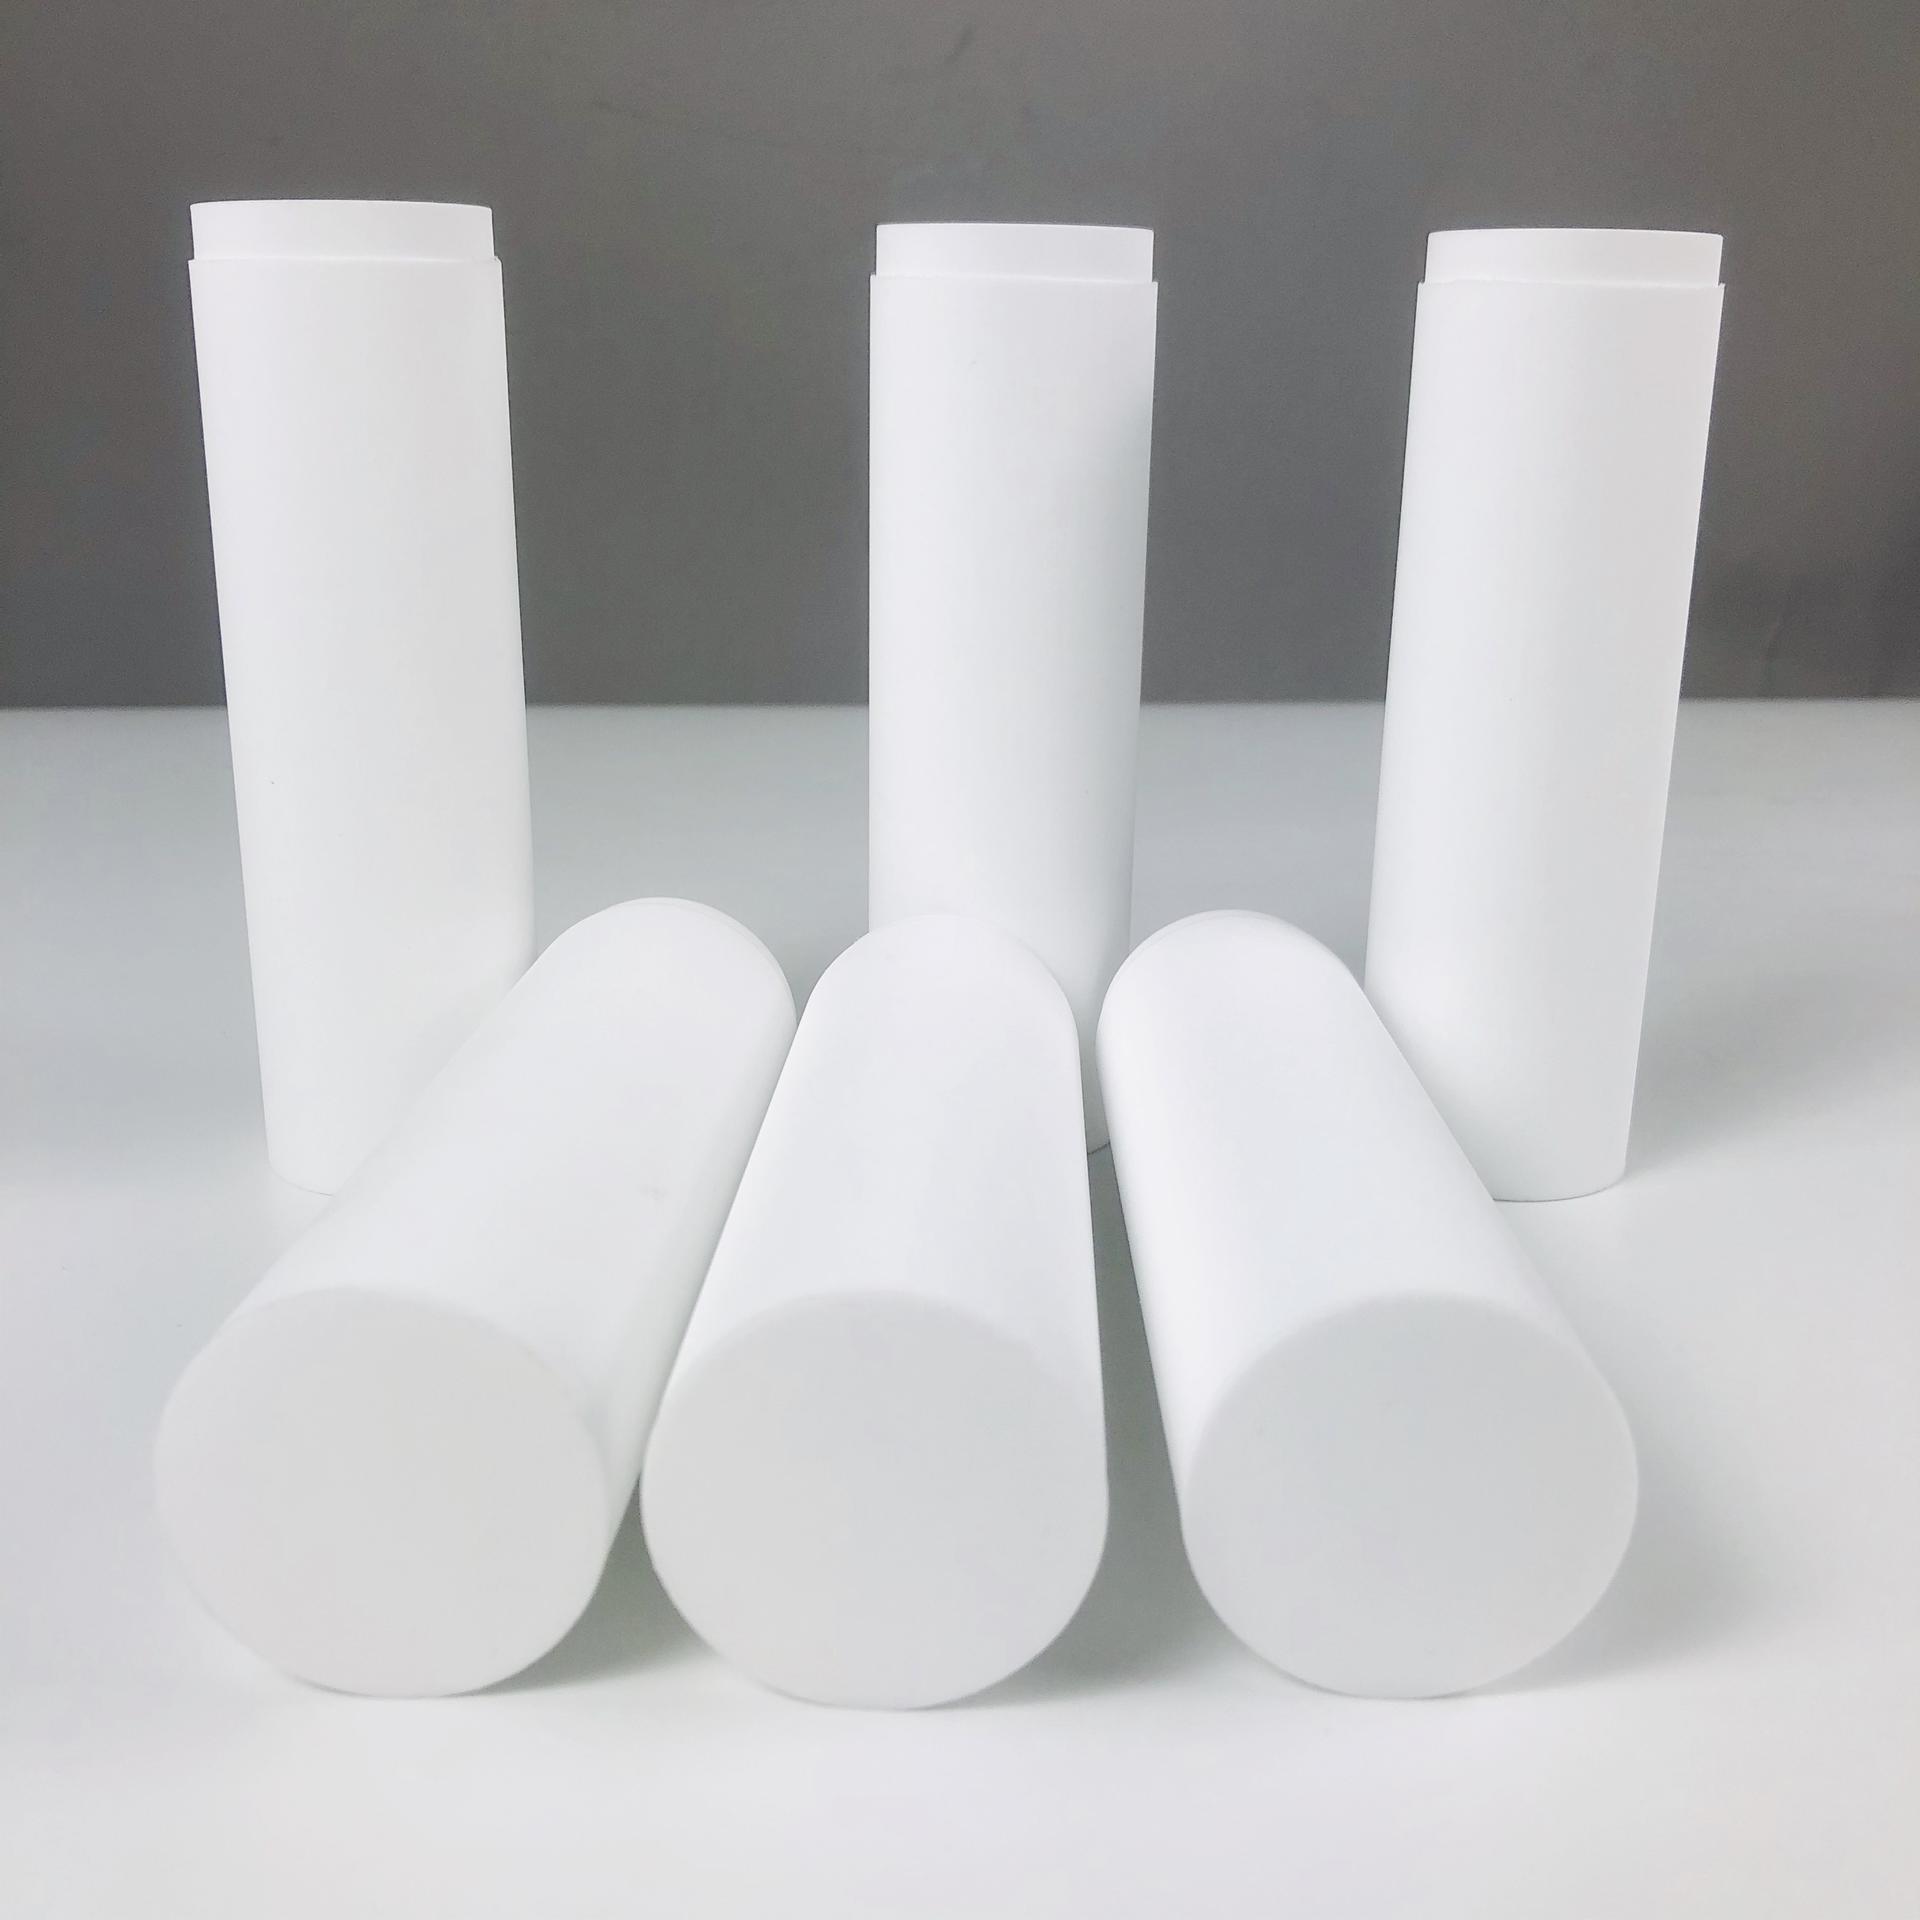 Factory customized 1 micron polypropylene sediment filter pp woven water filter cartridge